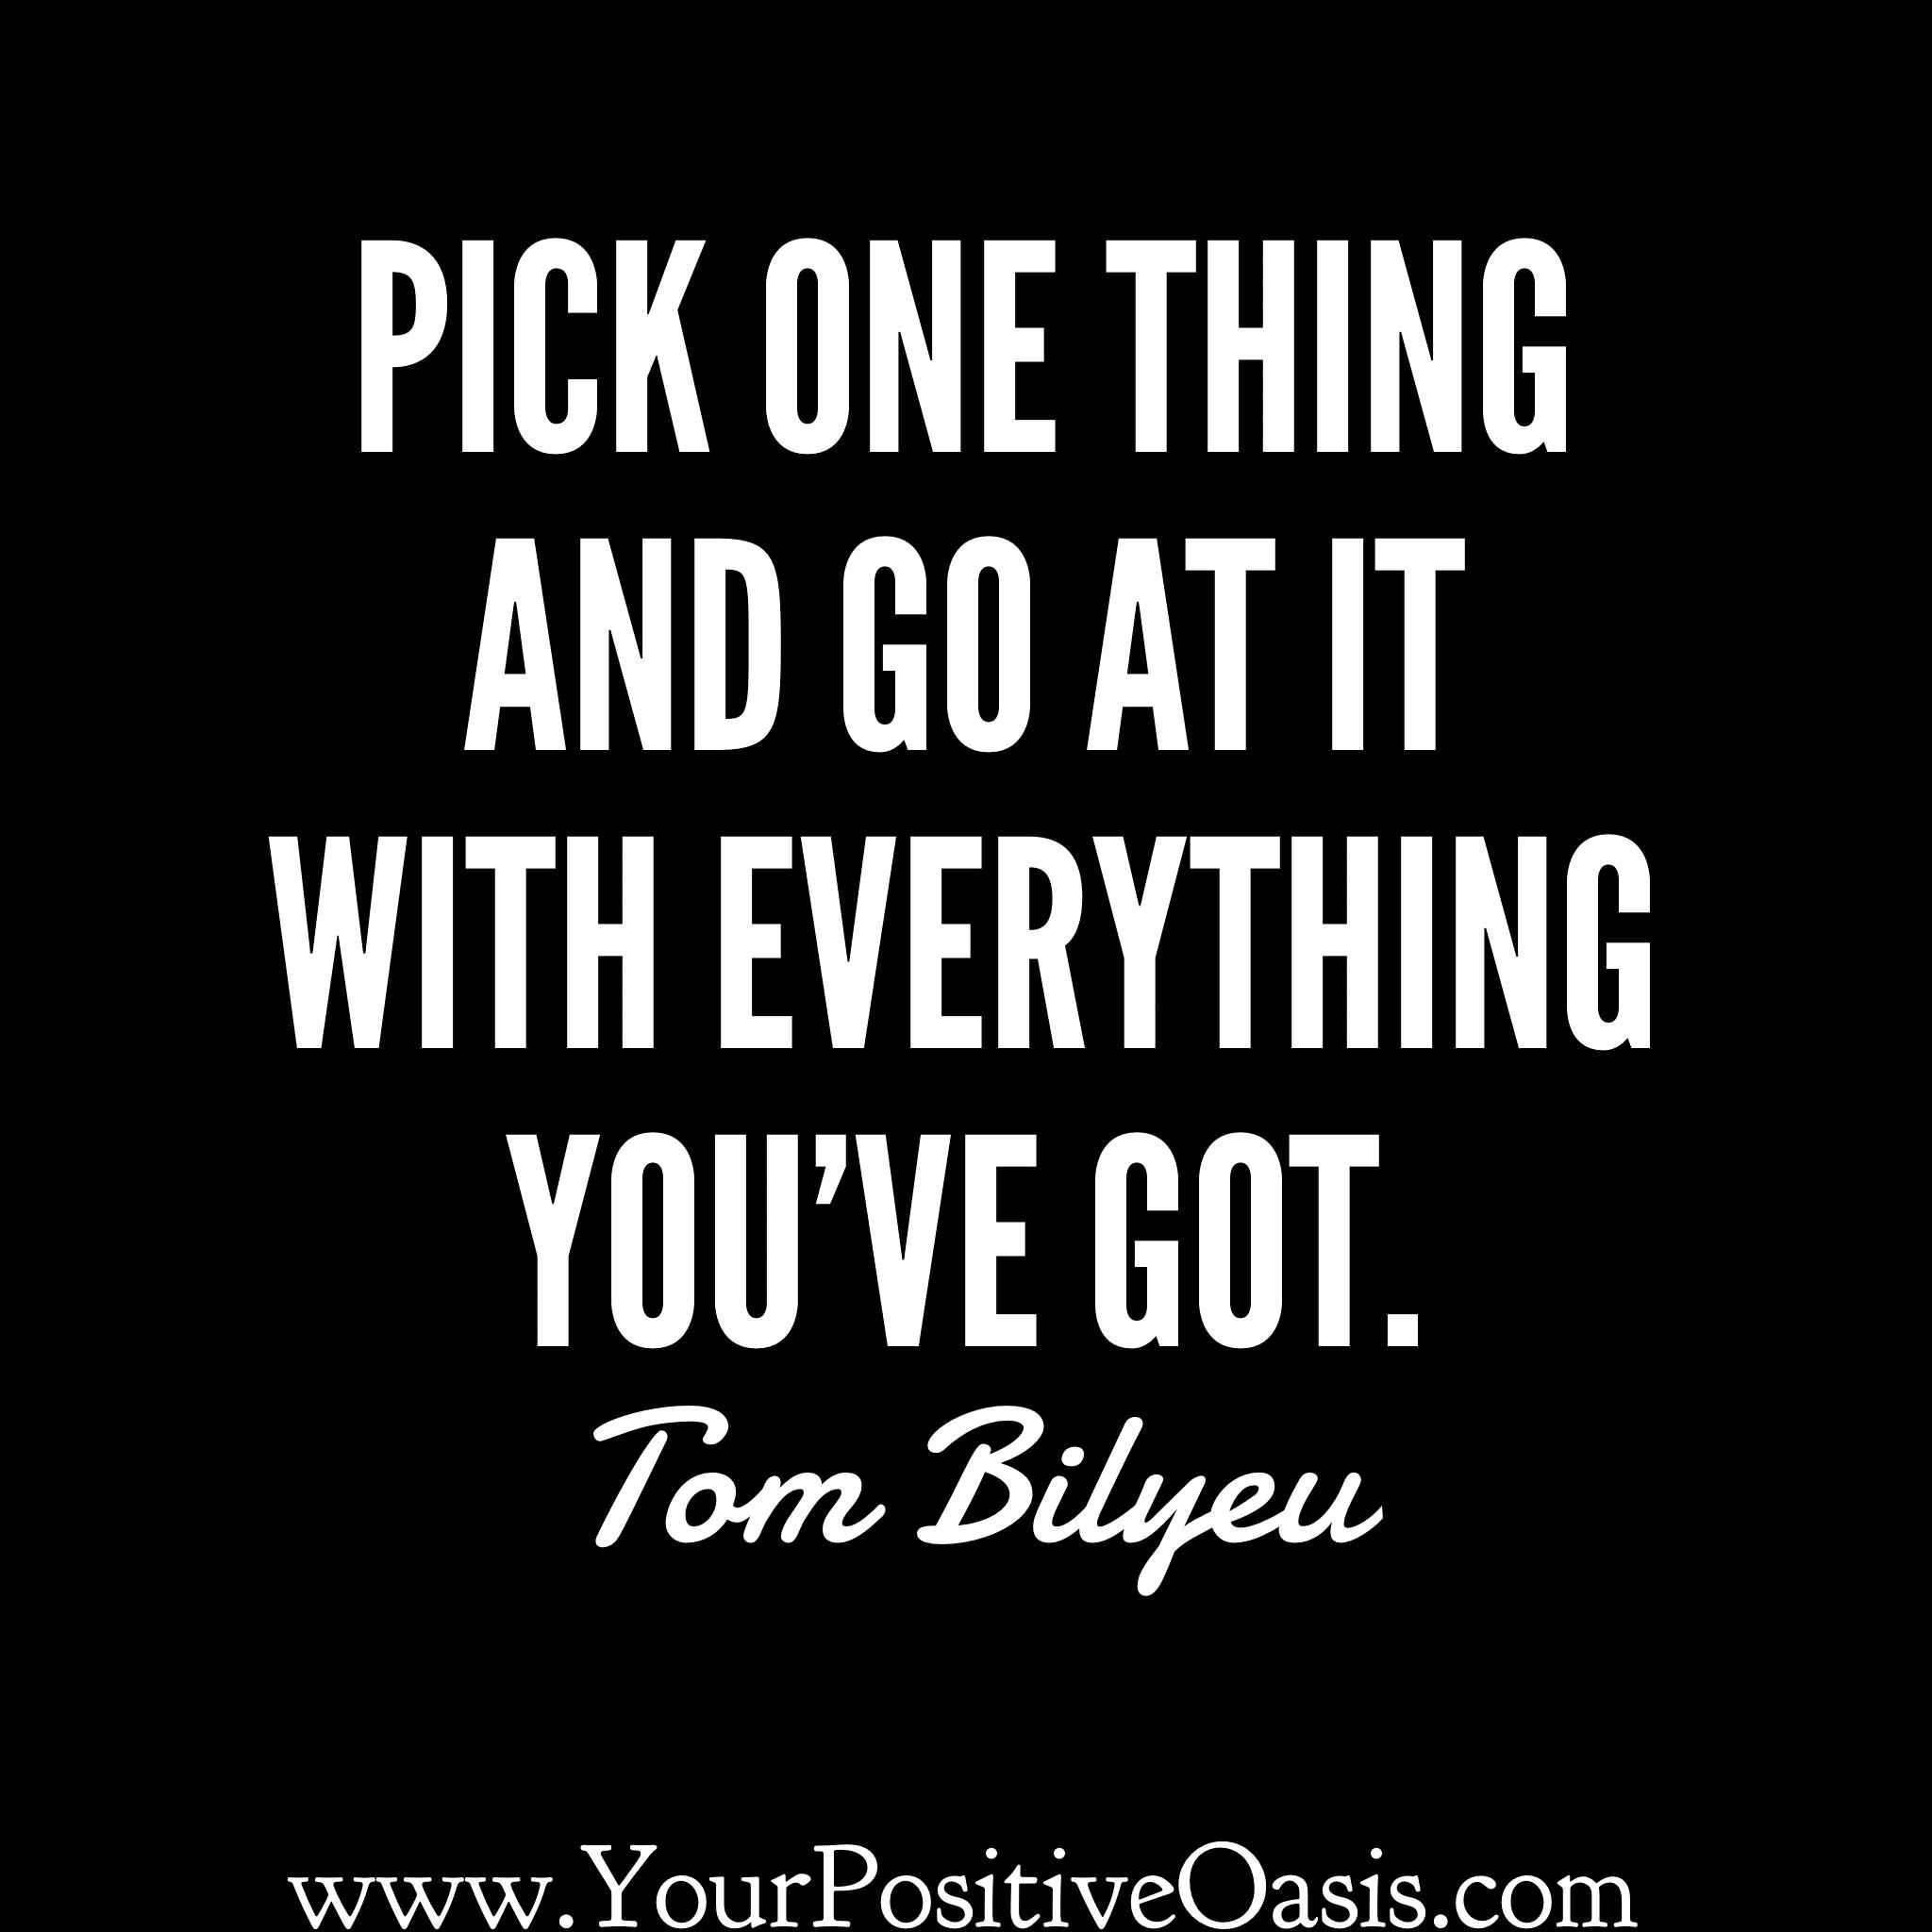 25 Best Tom Bilyeu Quotes on Success